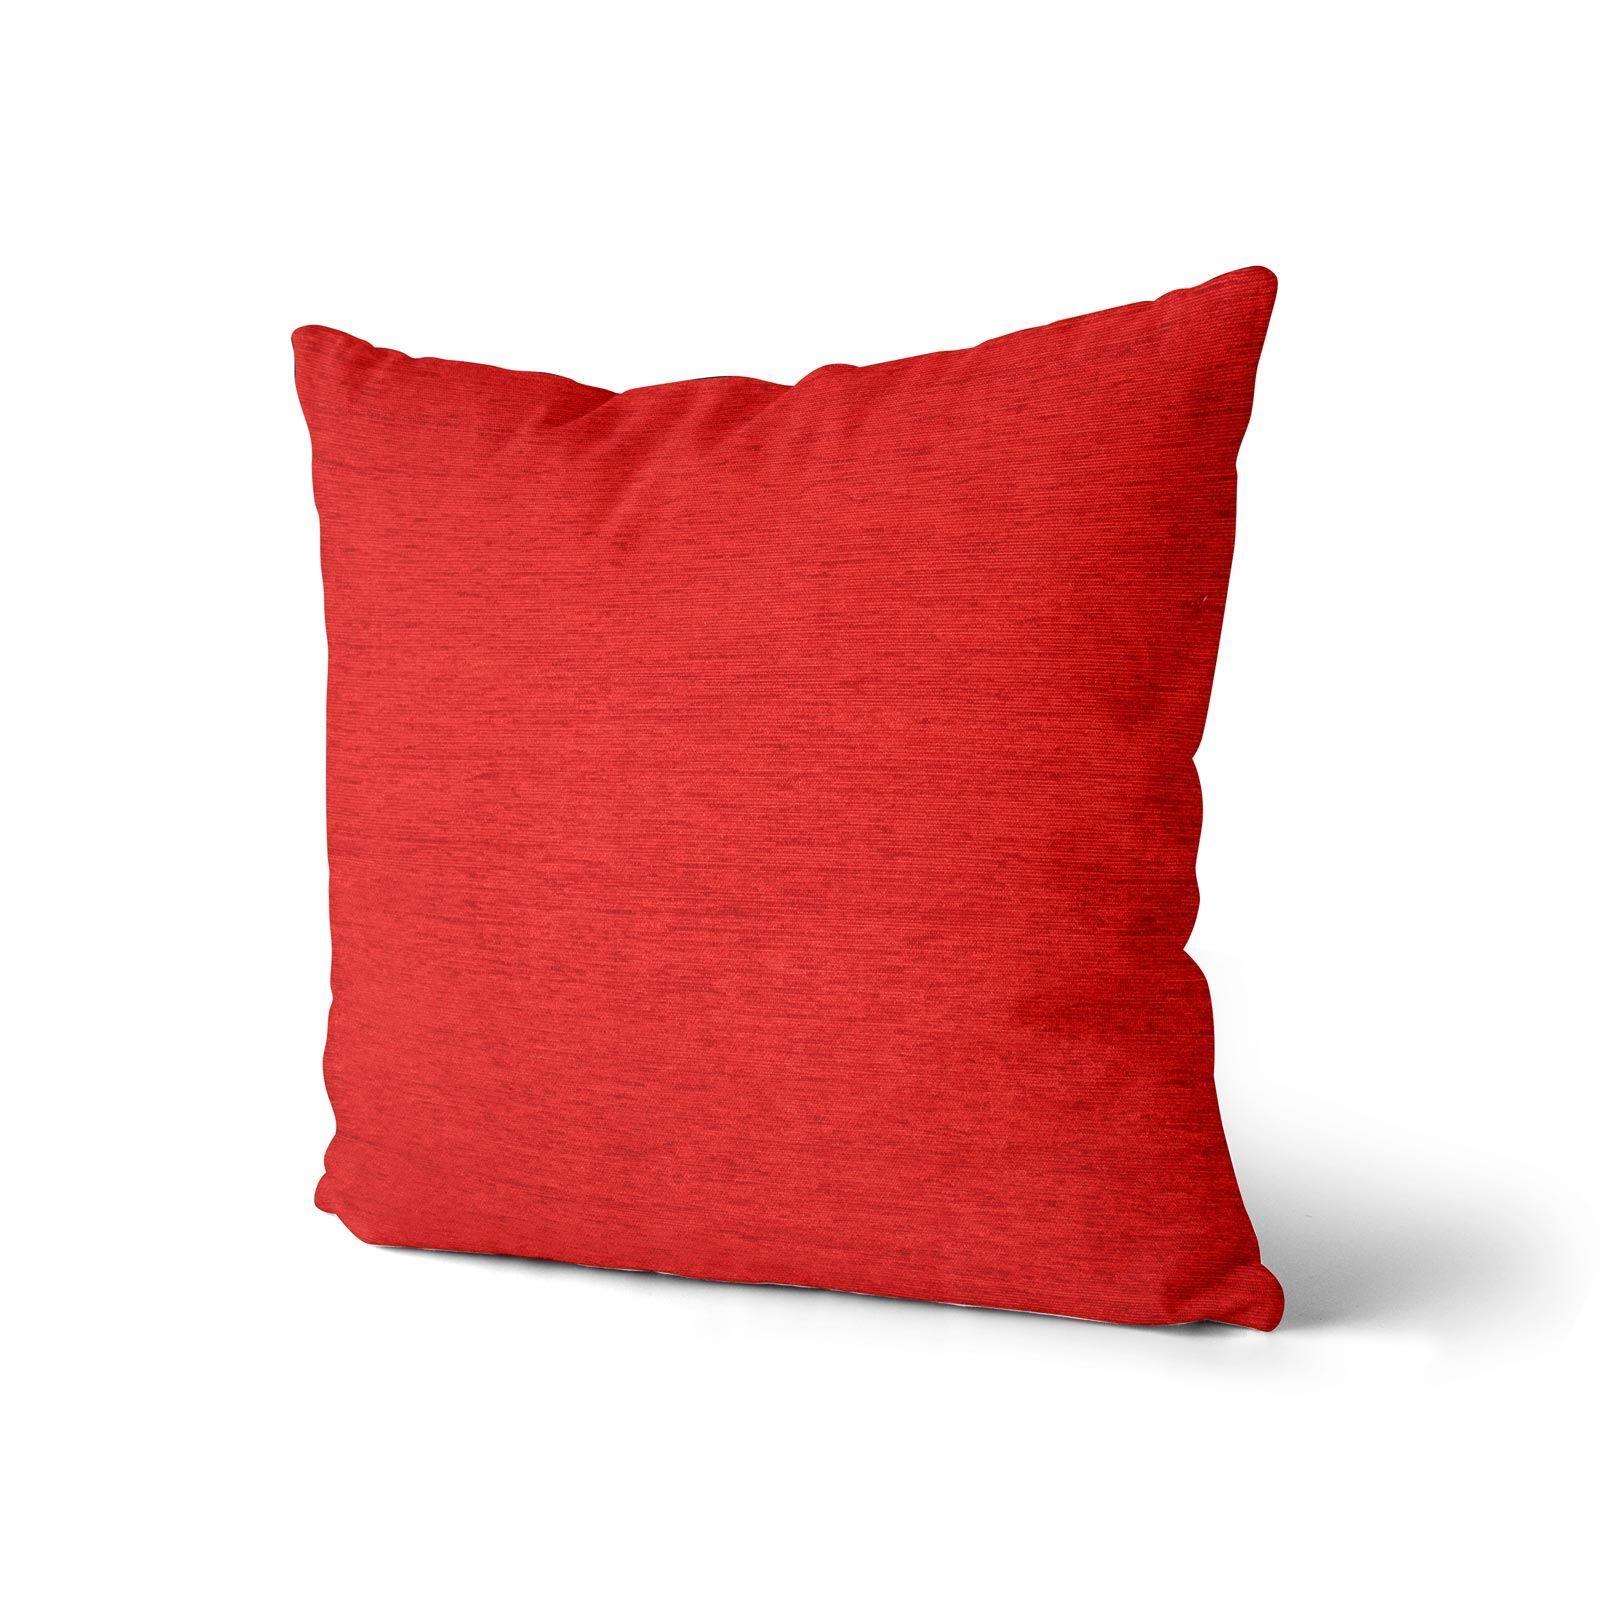 Vino-Tinto-Cushion-Covers-Coleccion-17-034-18-034-43cm-45cm-Cubierta miniatura 5